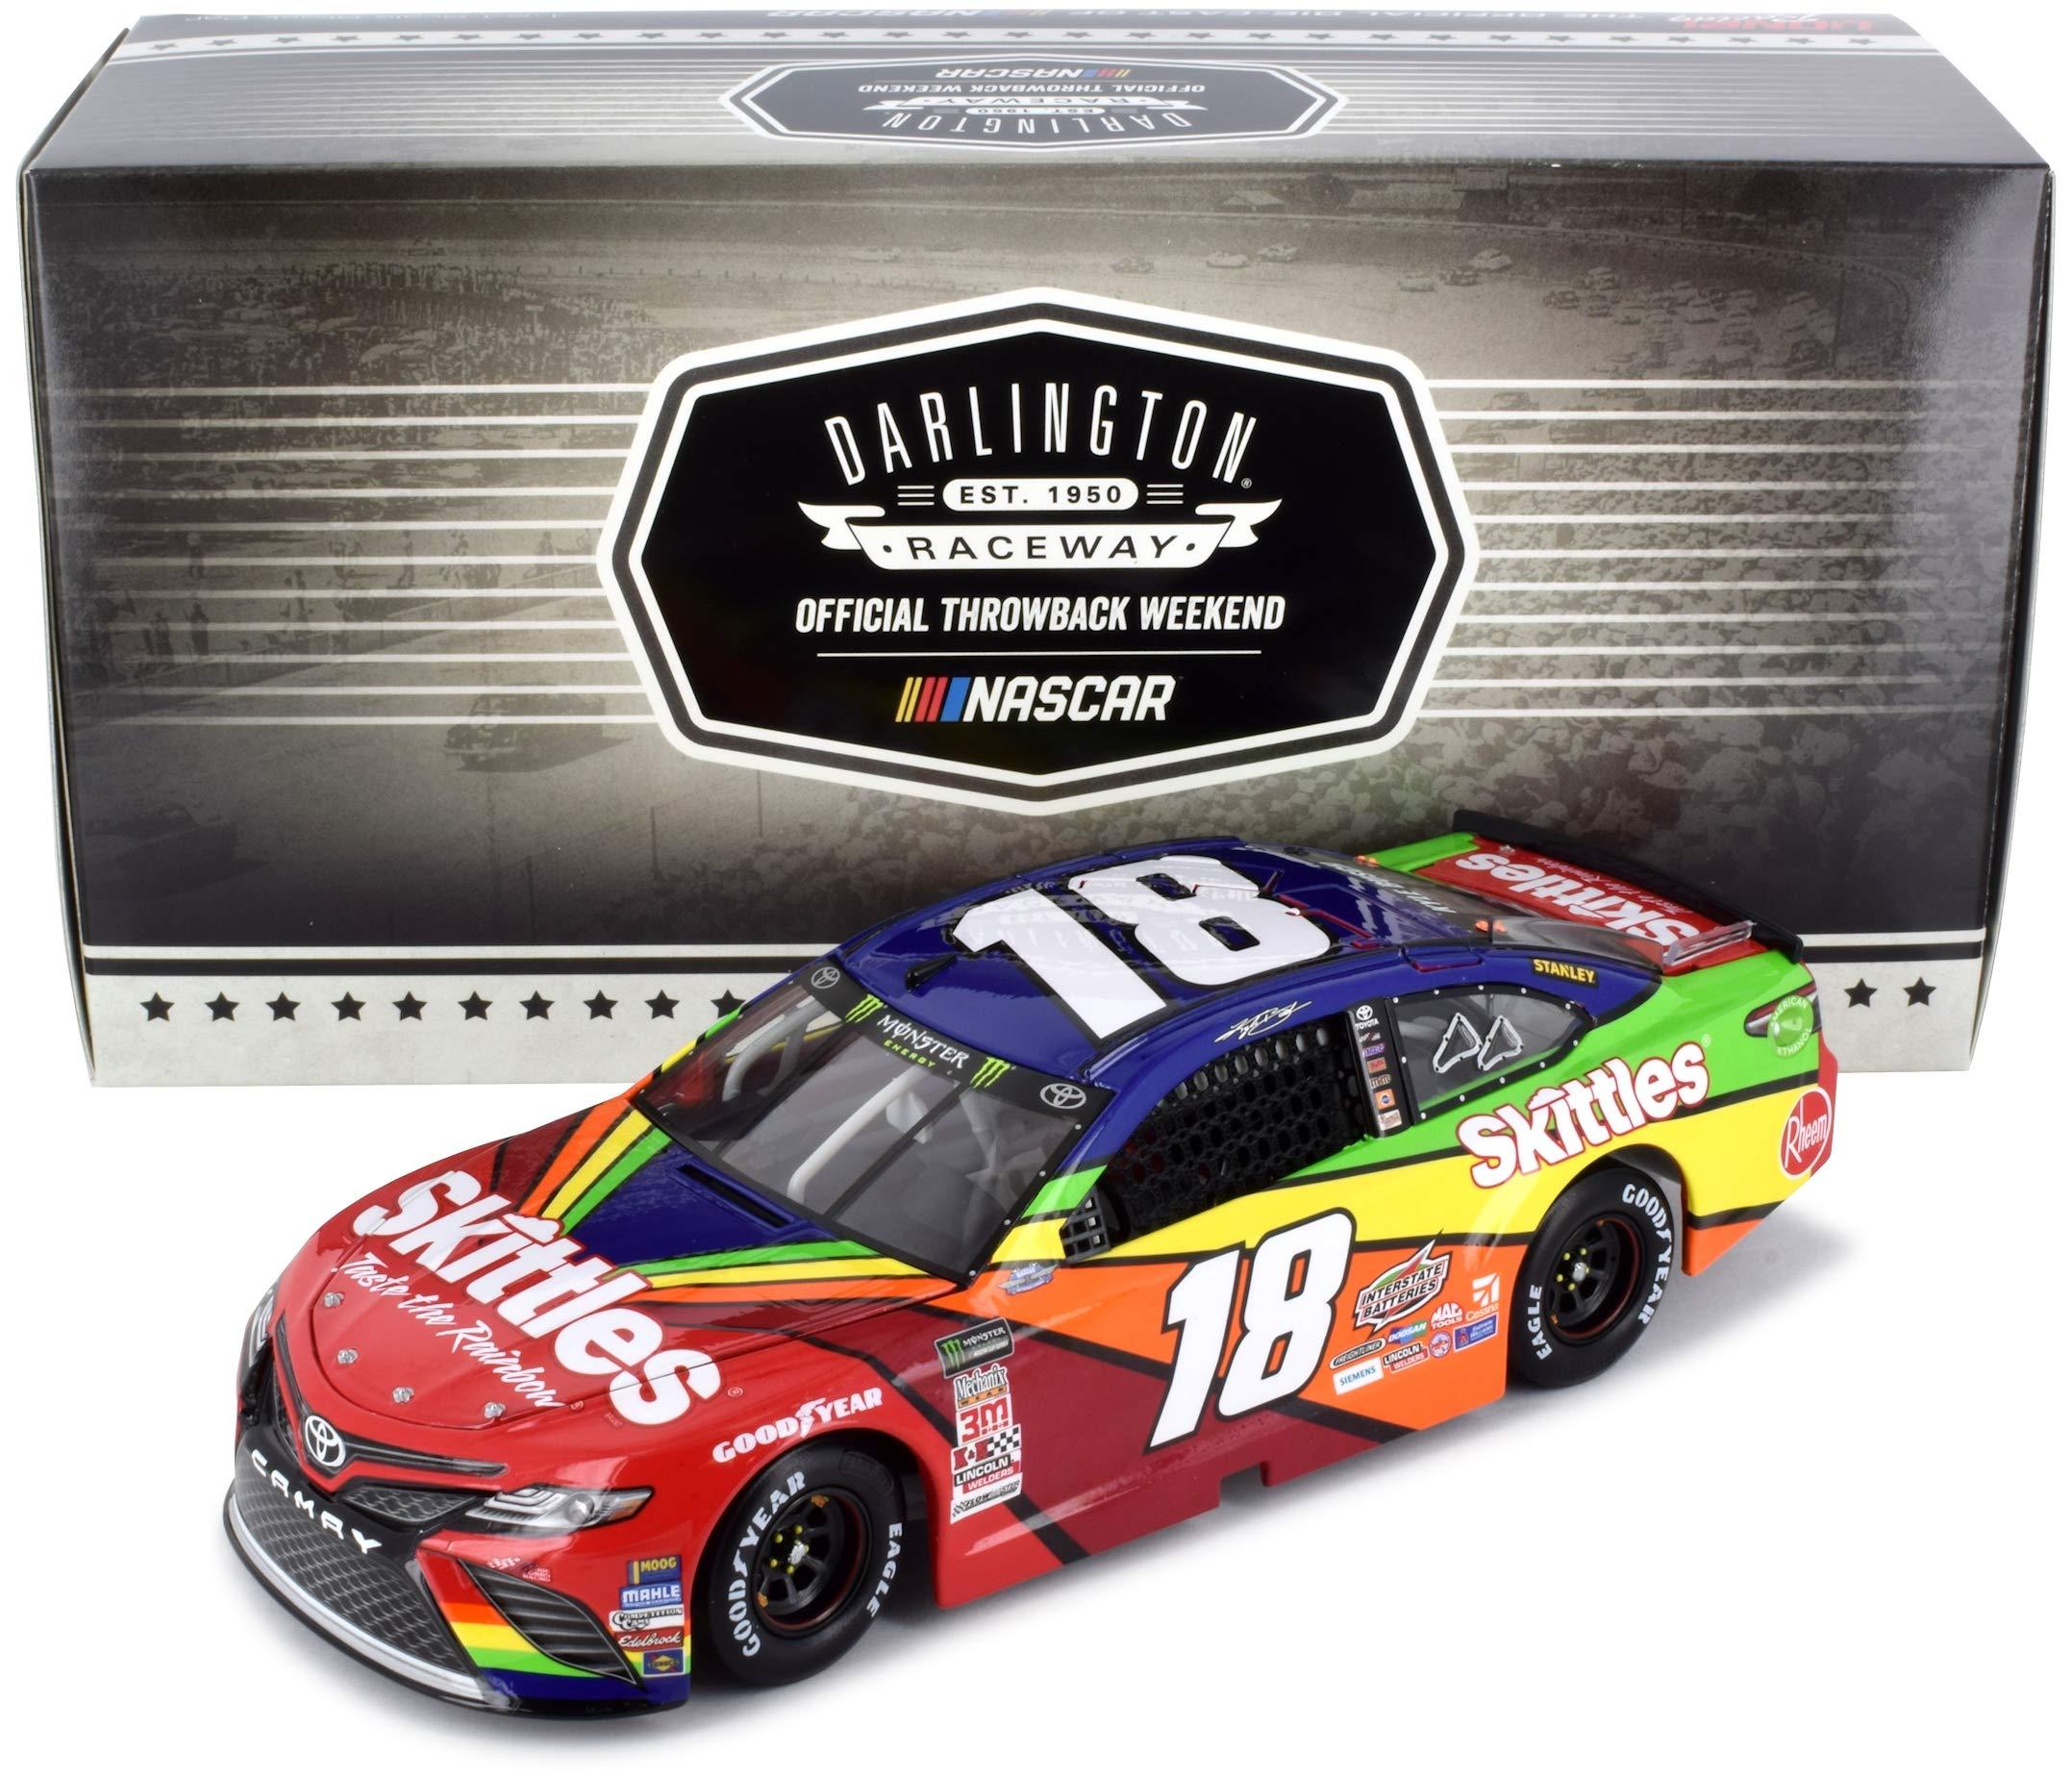 Lionel Racing Kyle Busch 2018 Darlington Throwback Skittles NASCAR Diecast Car 1:24 Scale